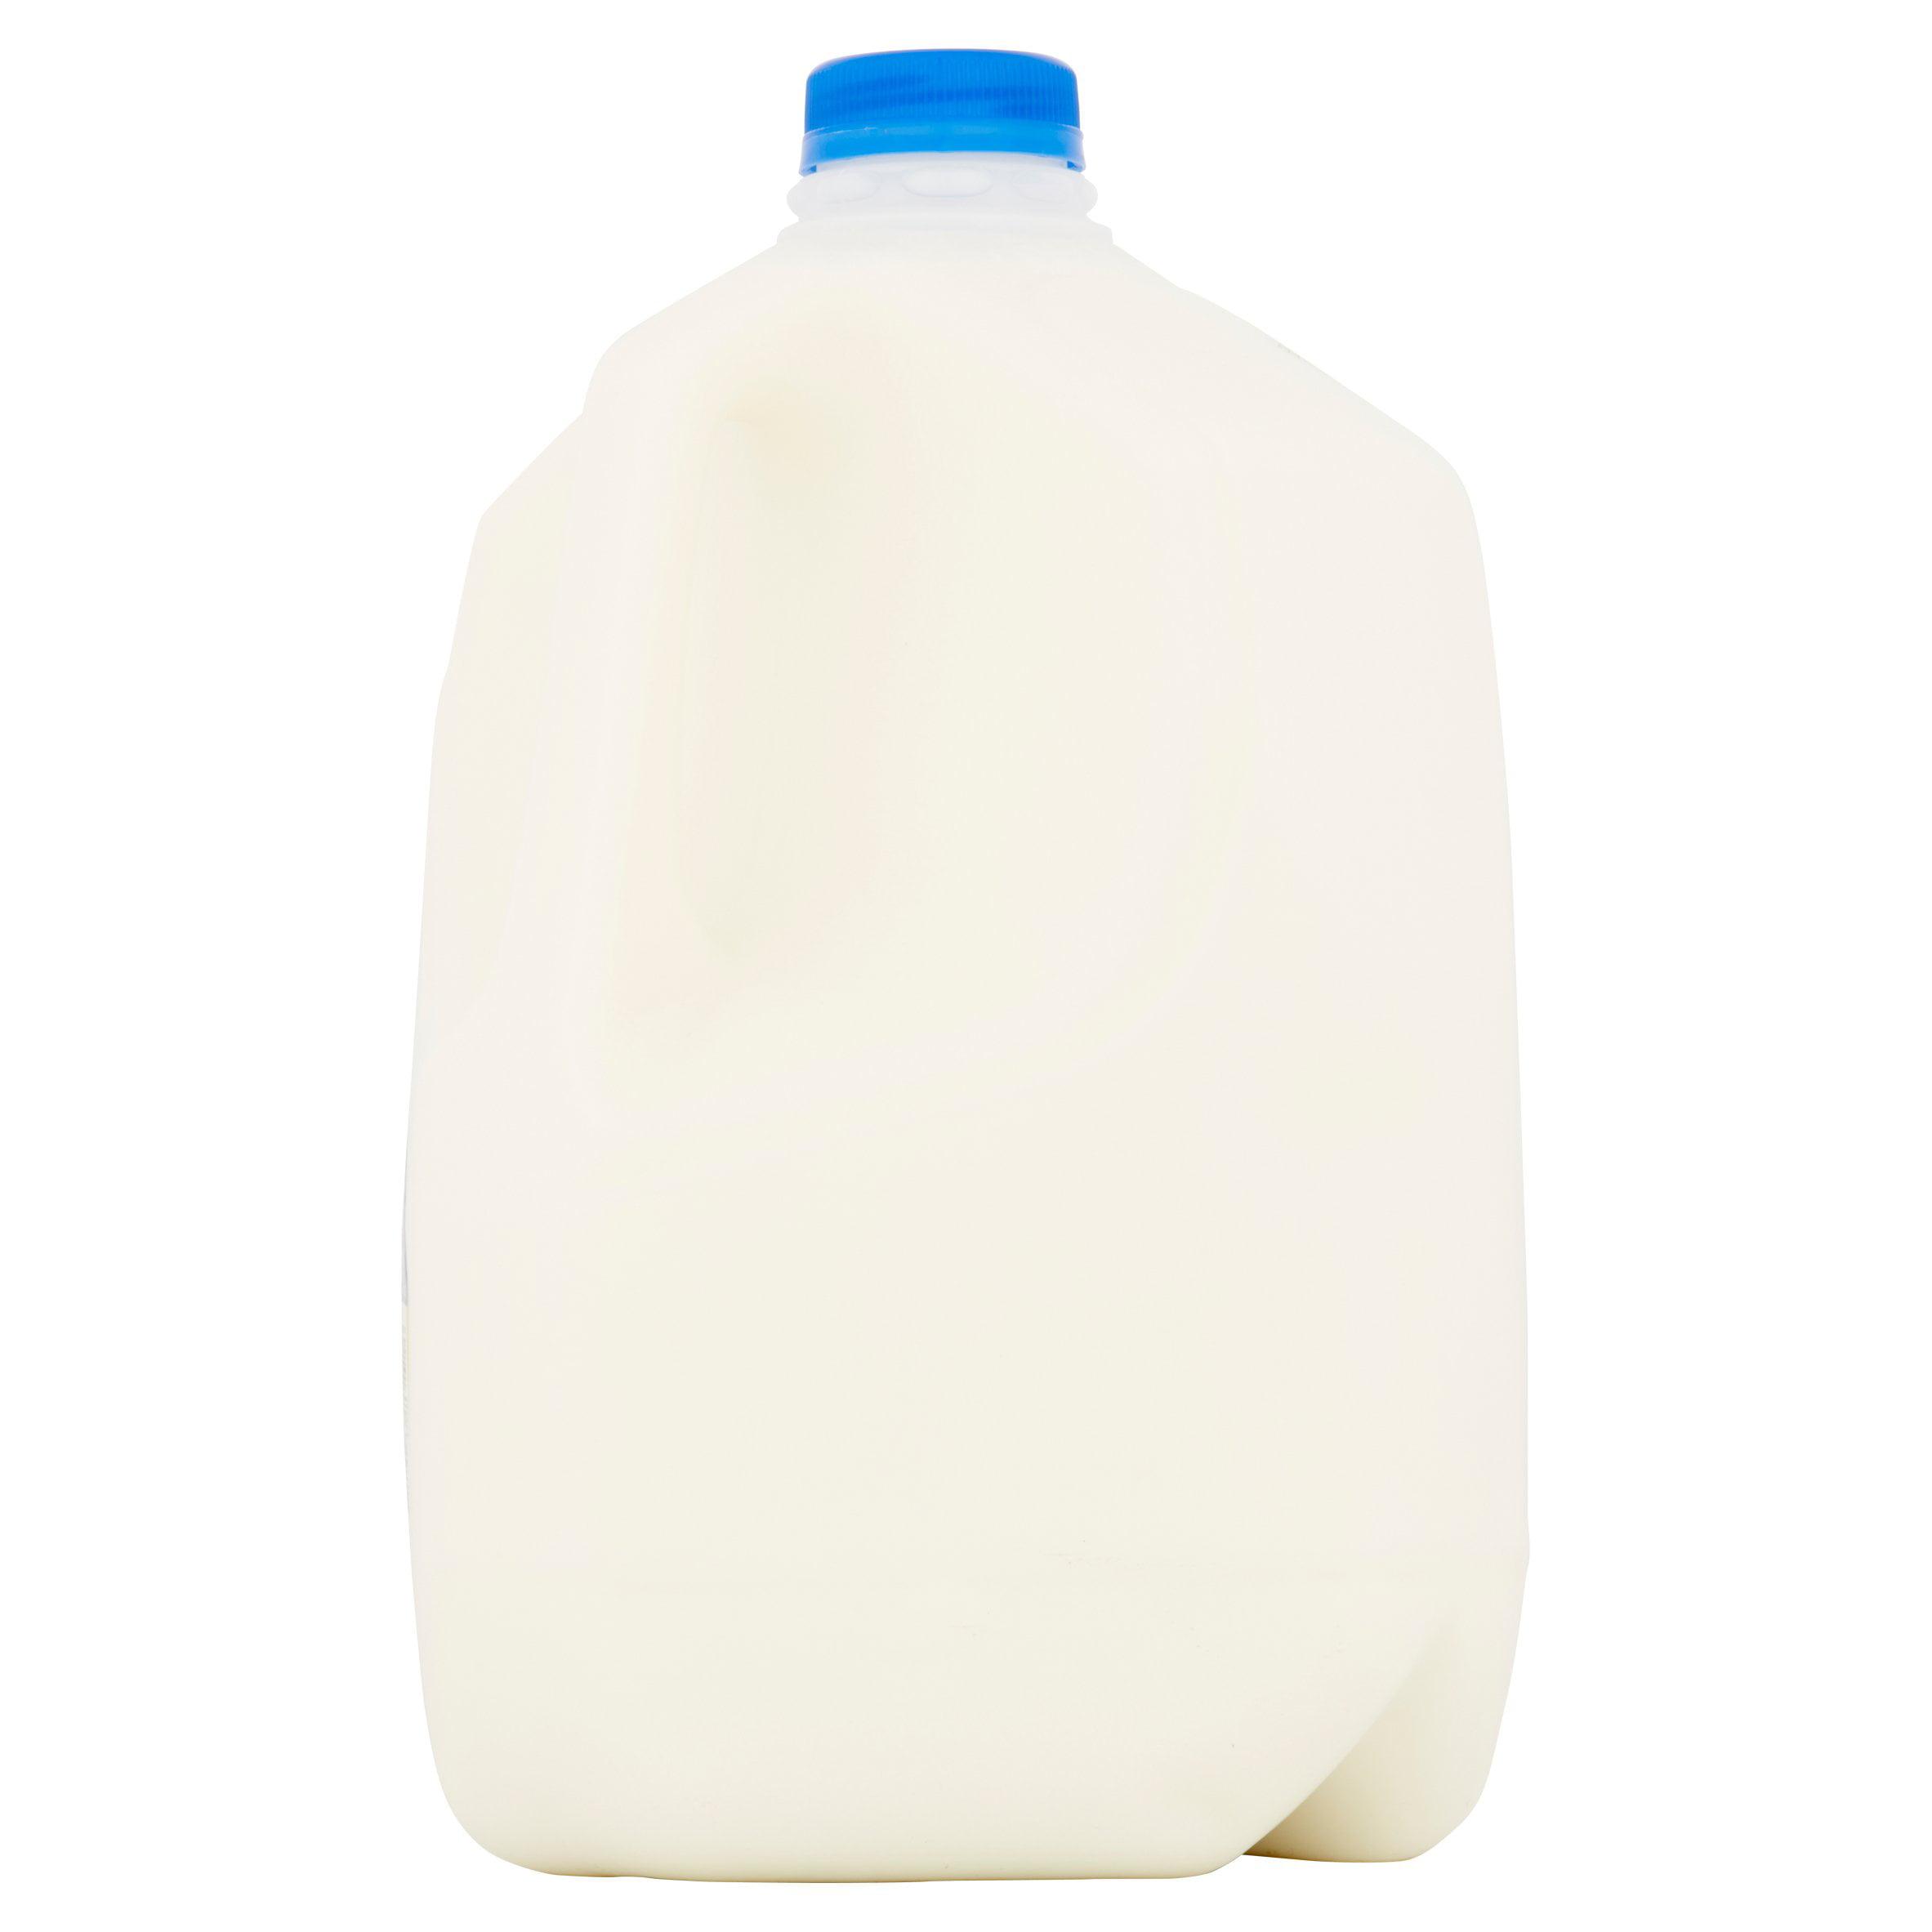 Great Value 2% Reduced Fat Milk, 1 gal - Walmart.com